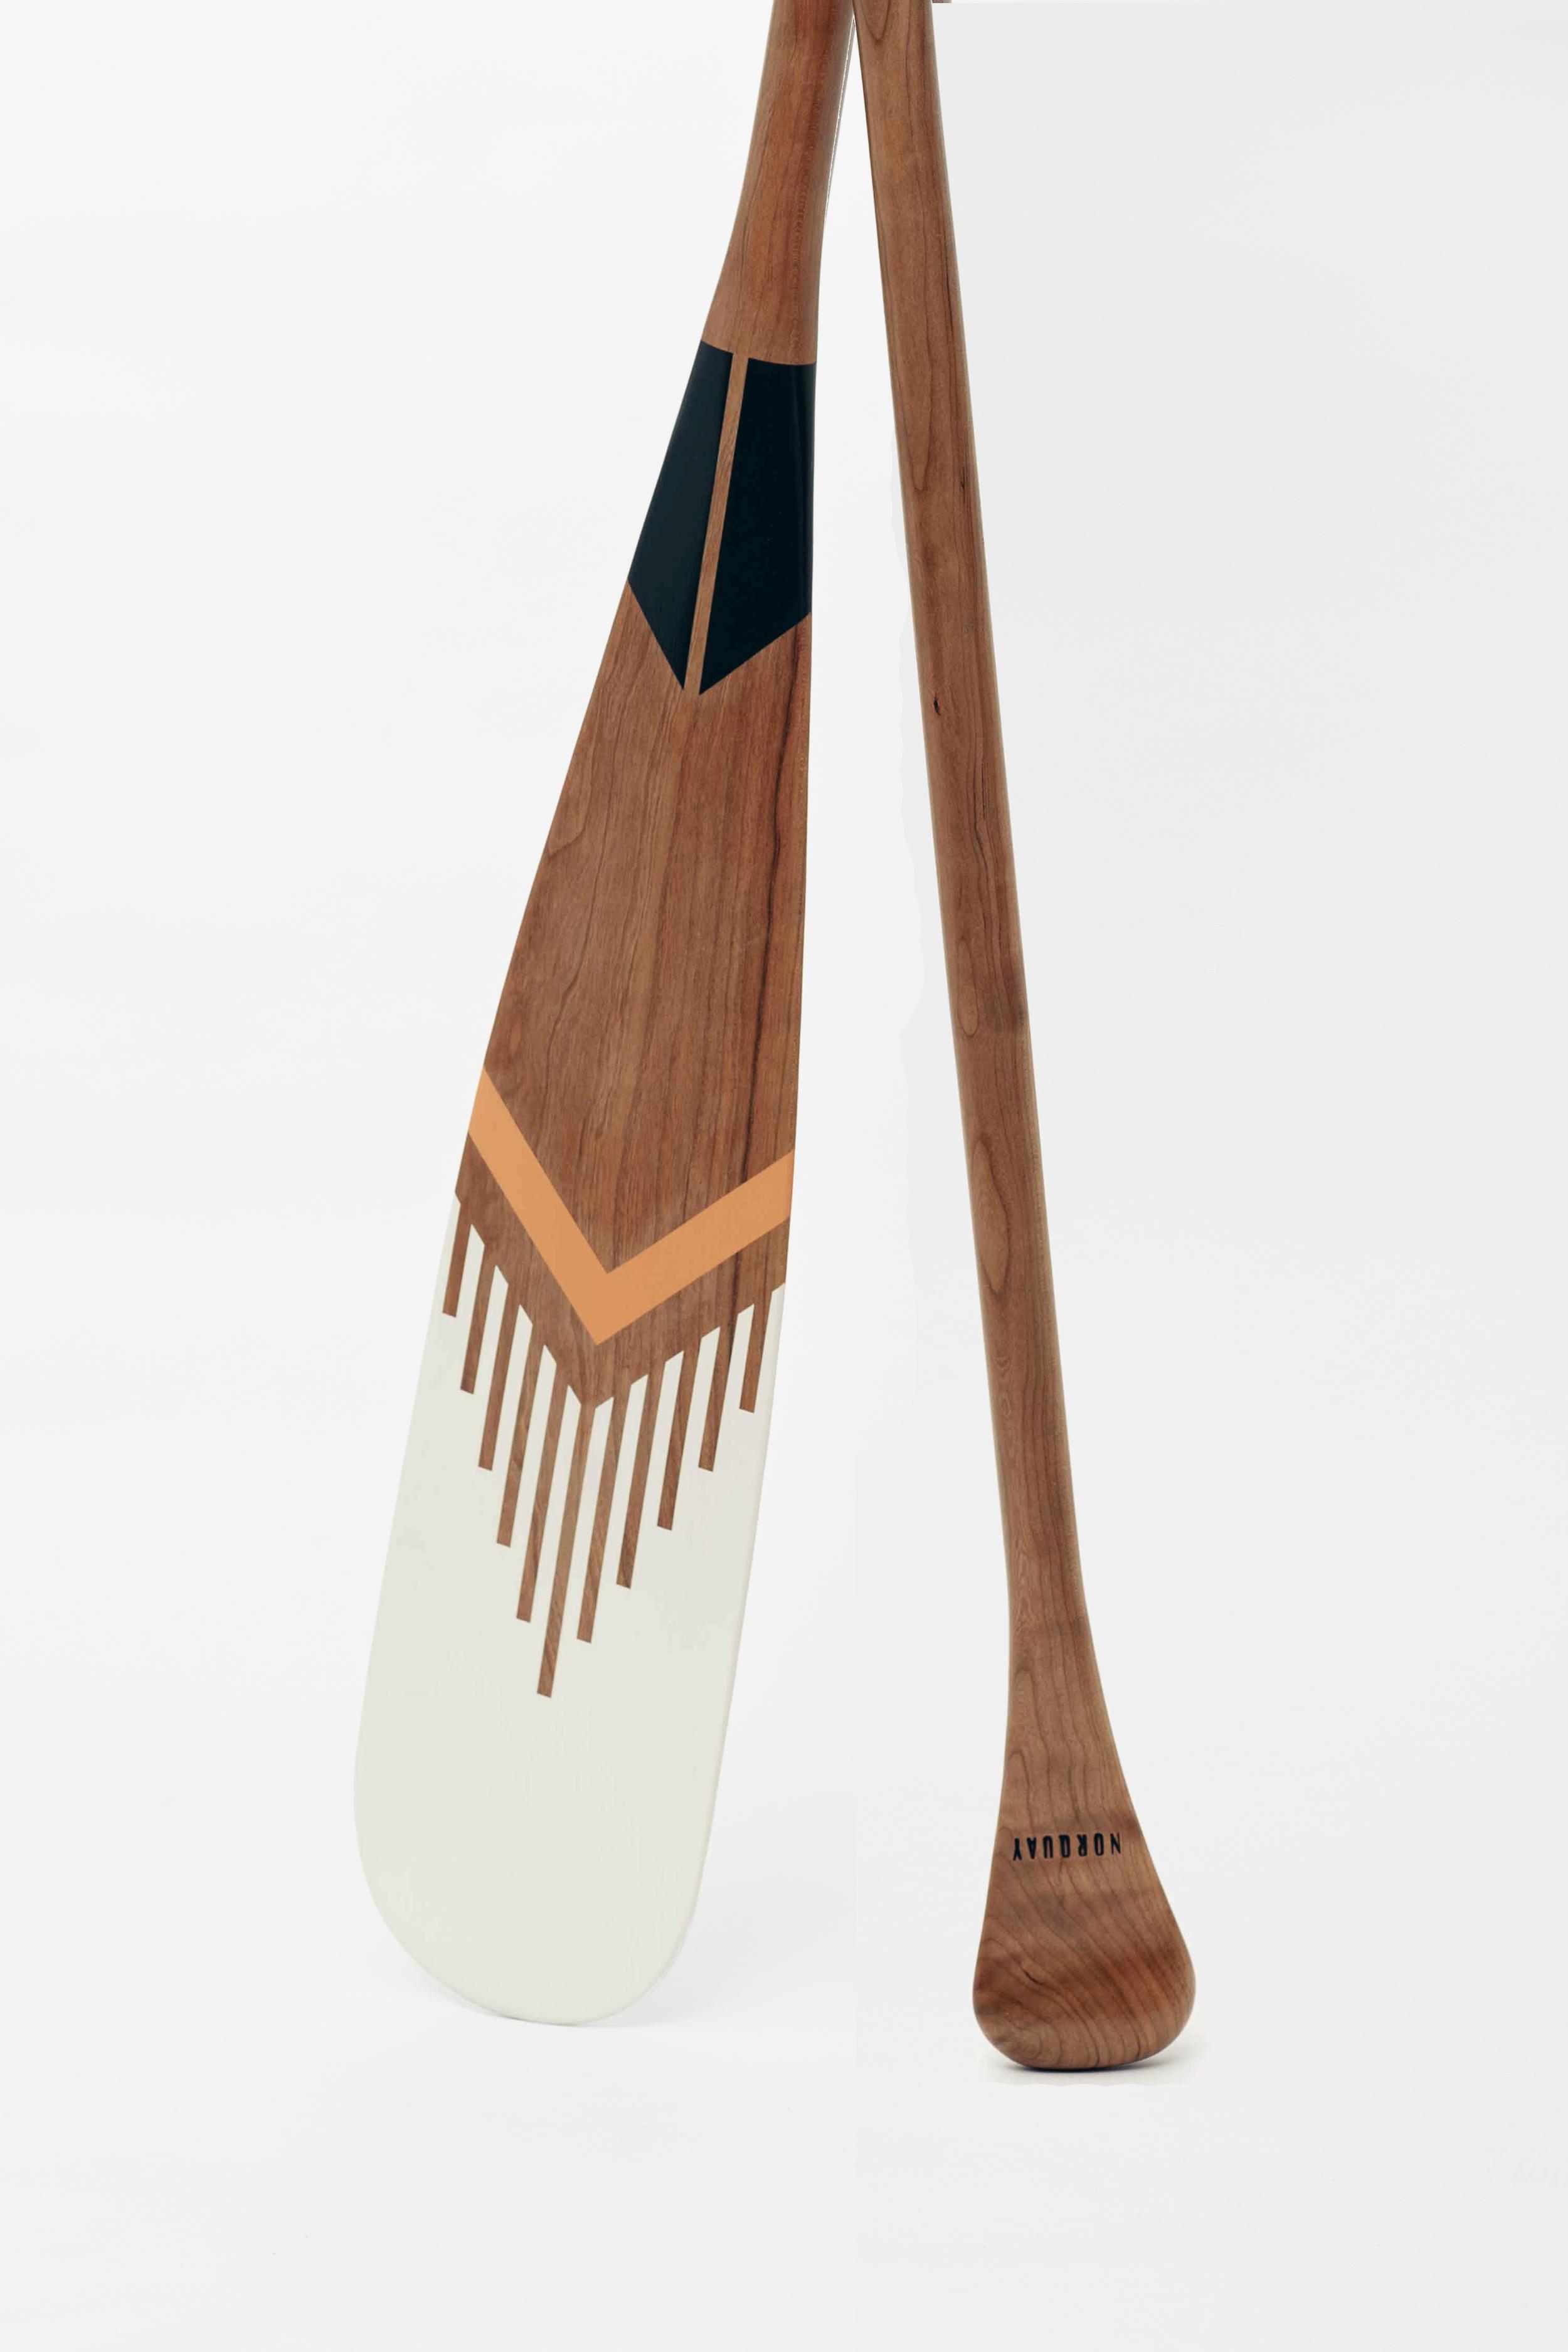 "Merit . 57"" Beavertail Canoe Paddle . (sold)"